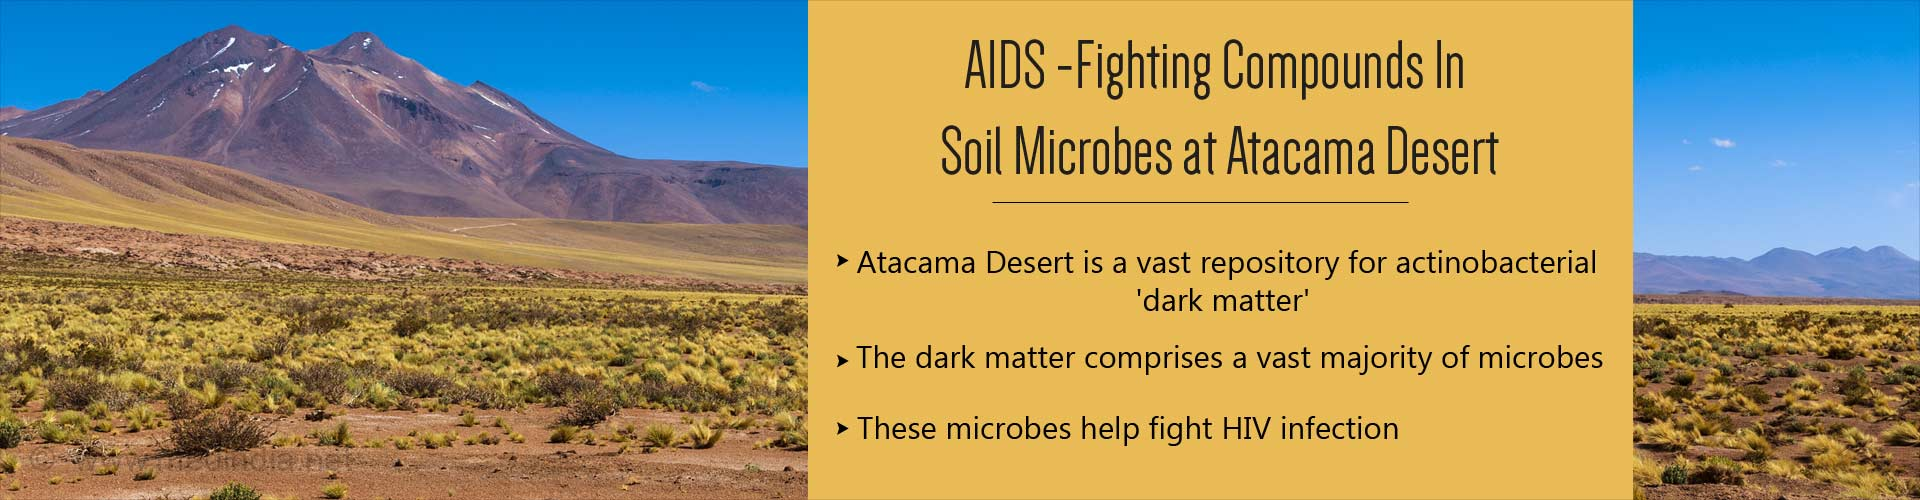 Soil Microbes in Atacama Desert Possess Compounds That Fight HIV